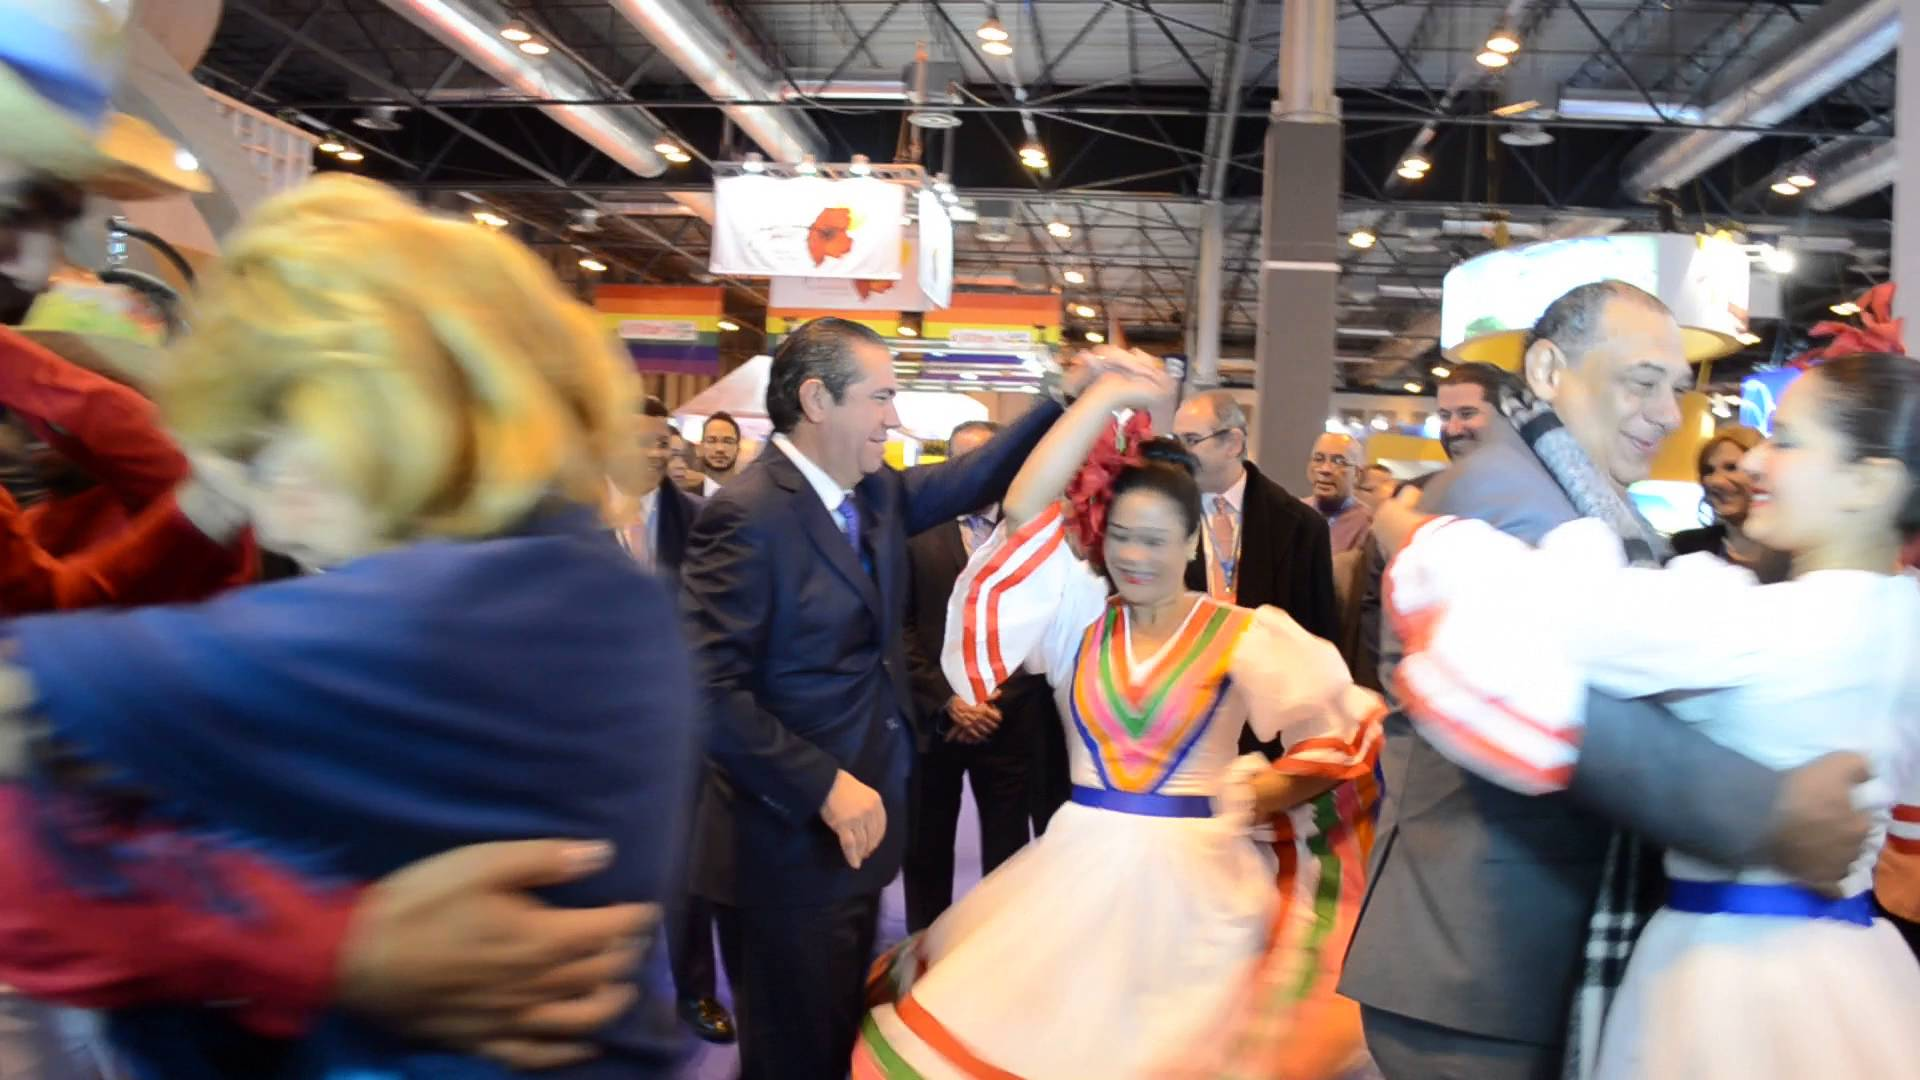 Ministro García se luce bailando un contagioso merengue